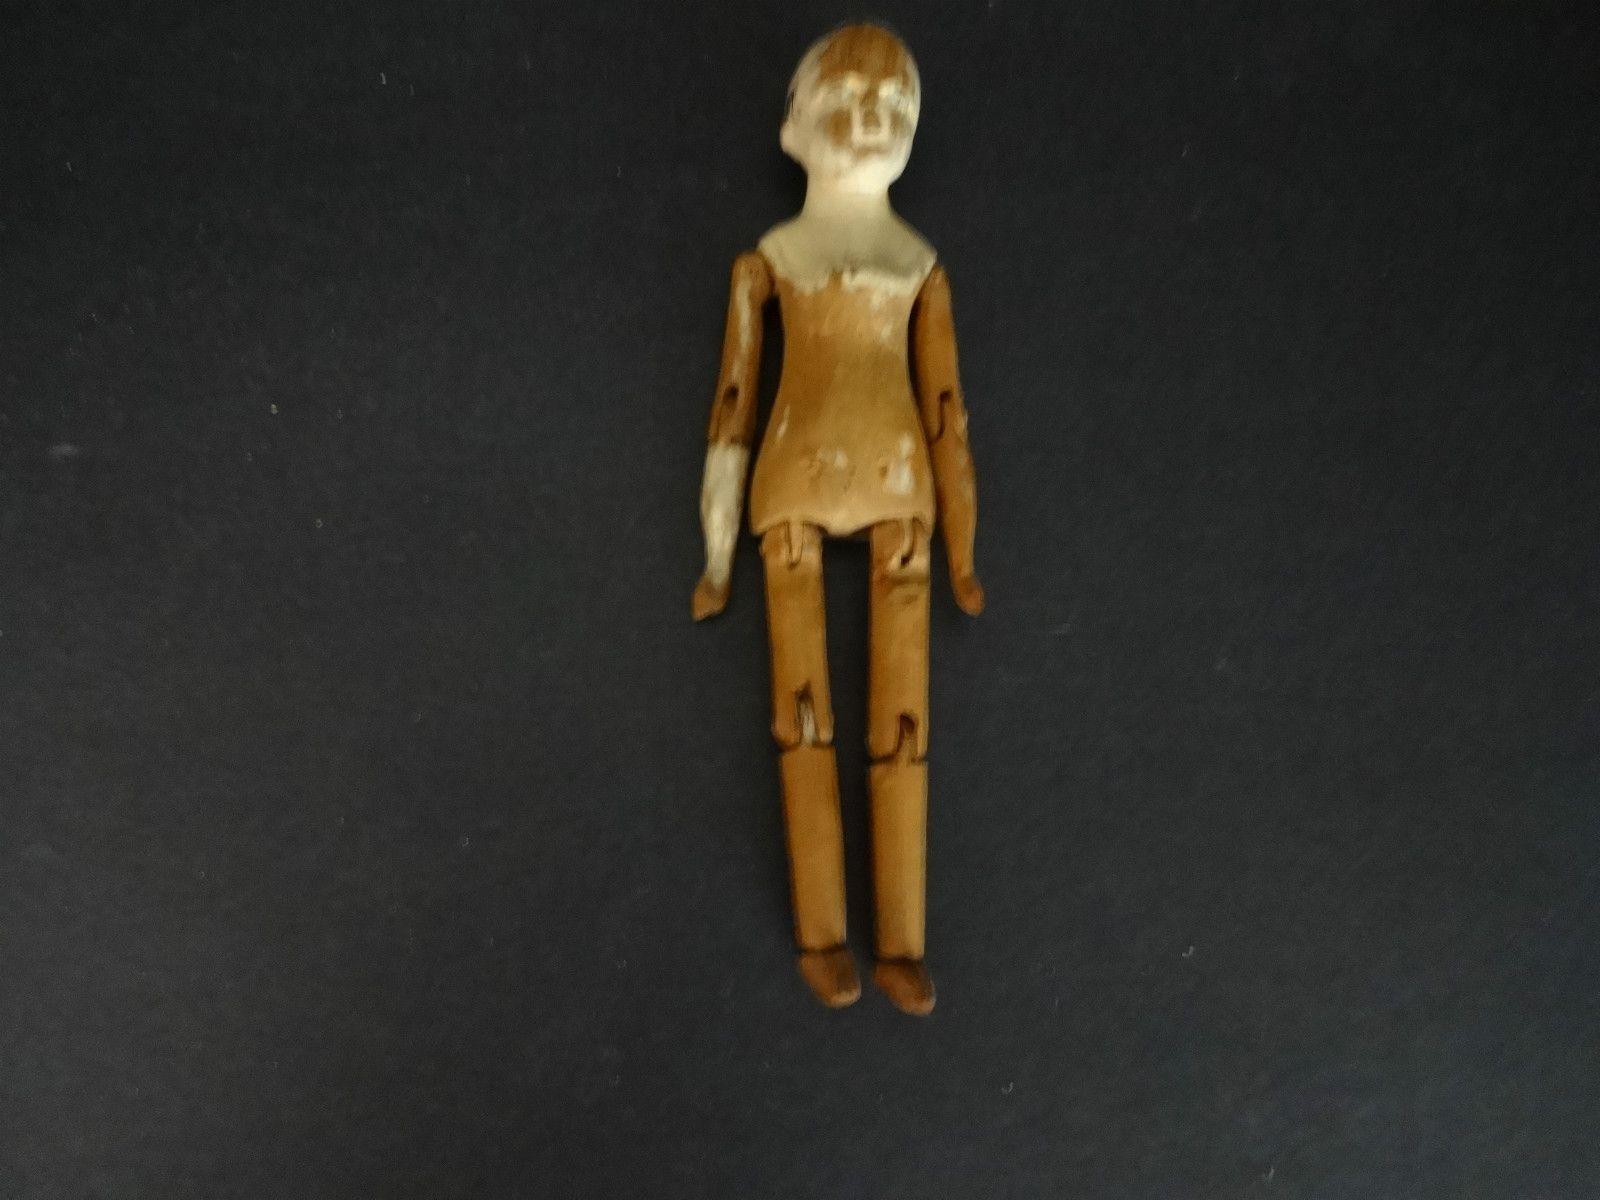 Early 8 inch Peg Wooden Doll | eBay